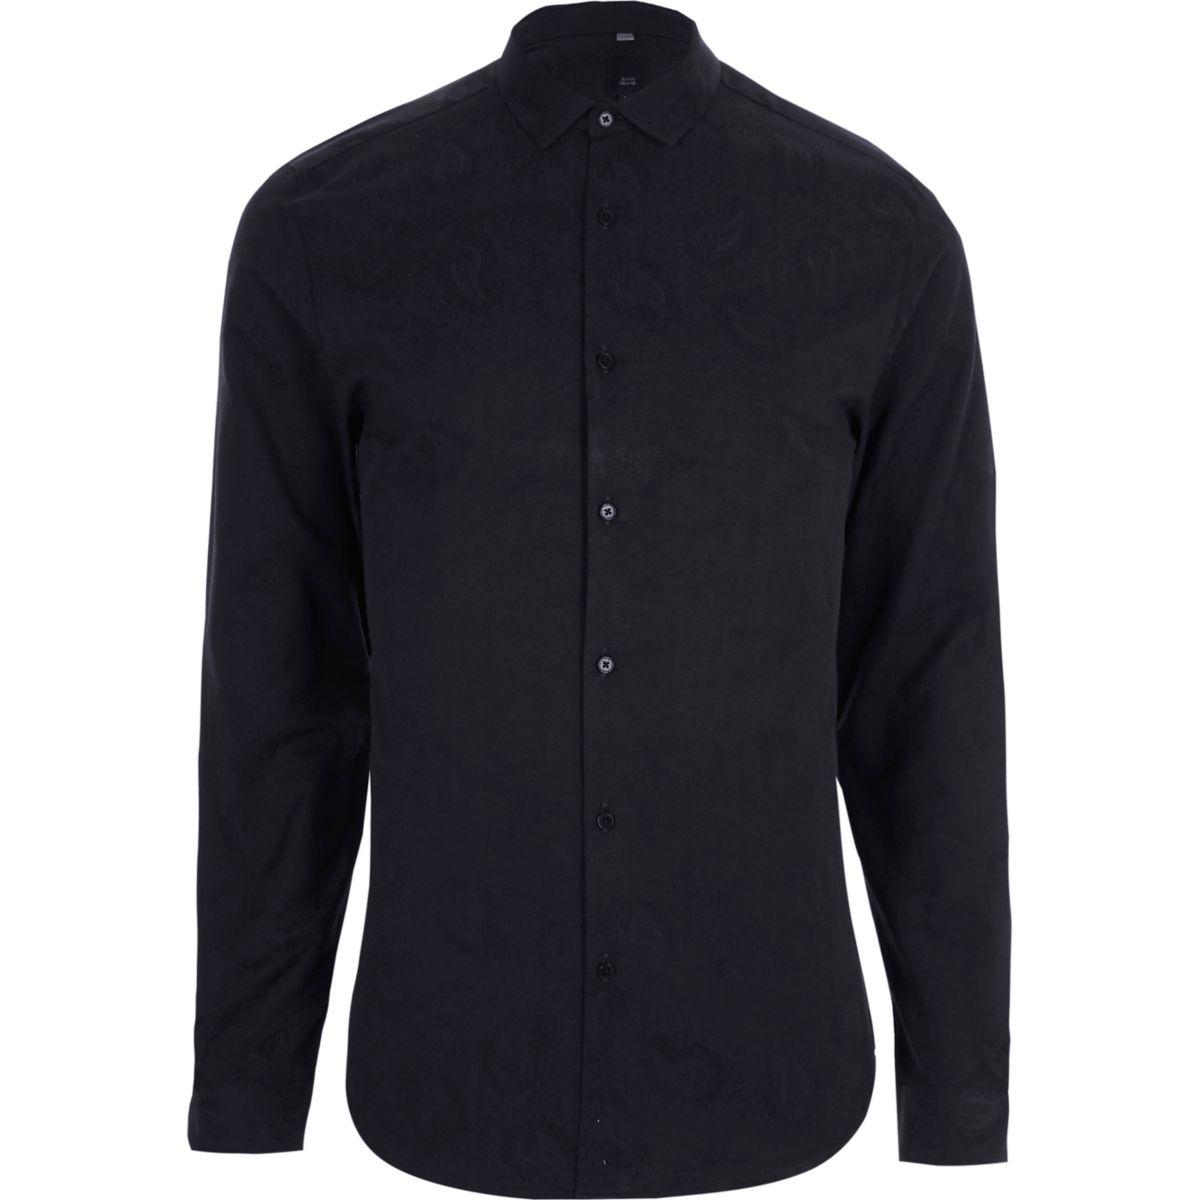 Navy paisley jacquard slim fit shirt